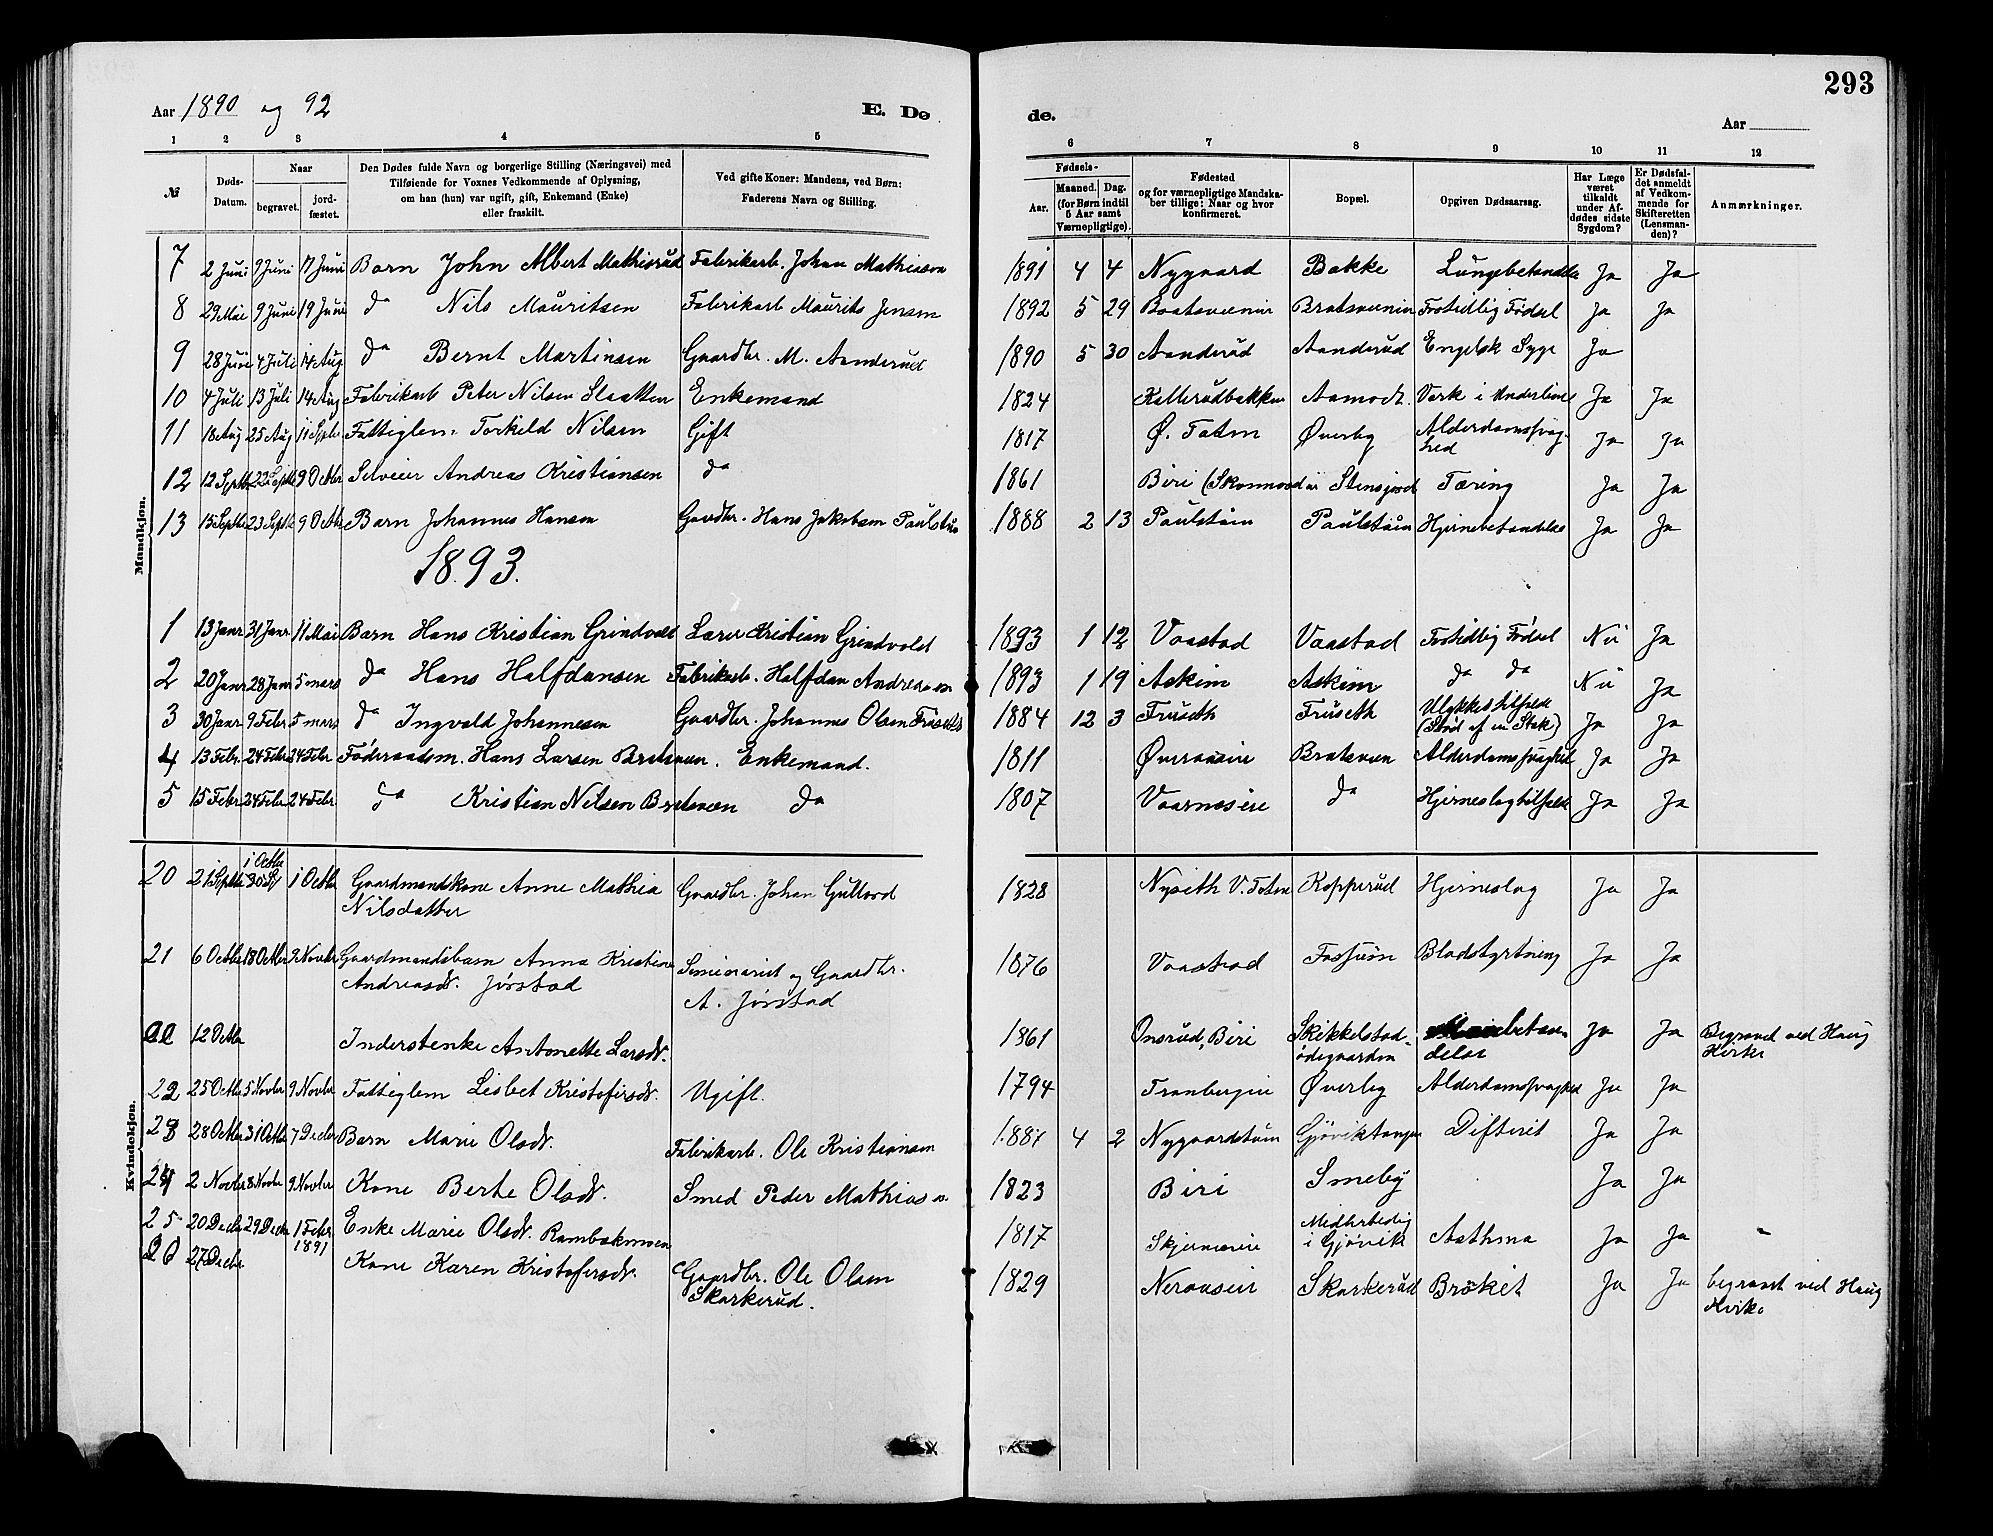 SAH, Vardal prestekontor, H/Ha/Hab/L0007: Klokkerbok nr. 7 /1, 1881-1895, s. 293